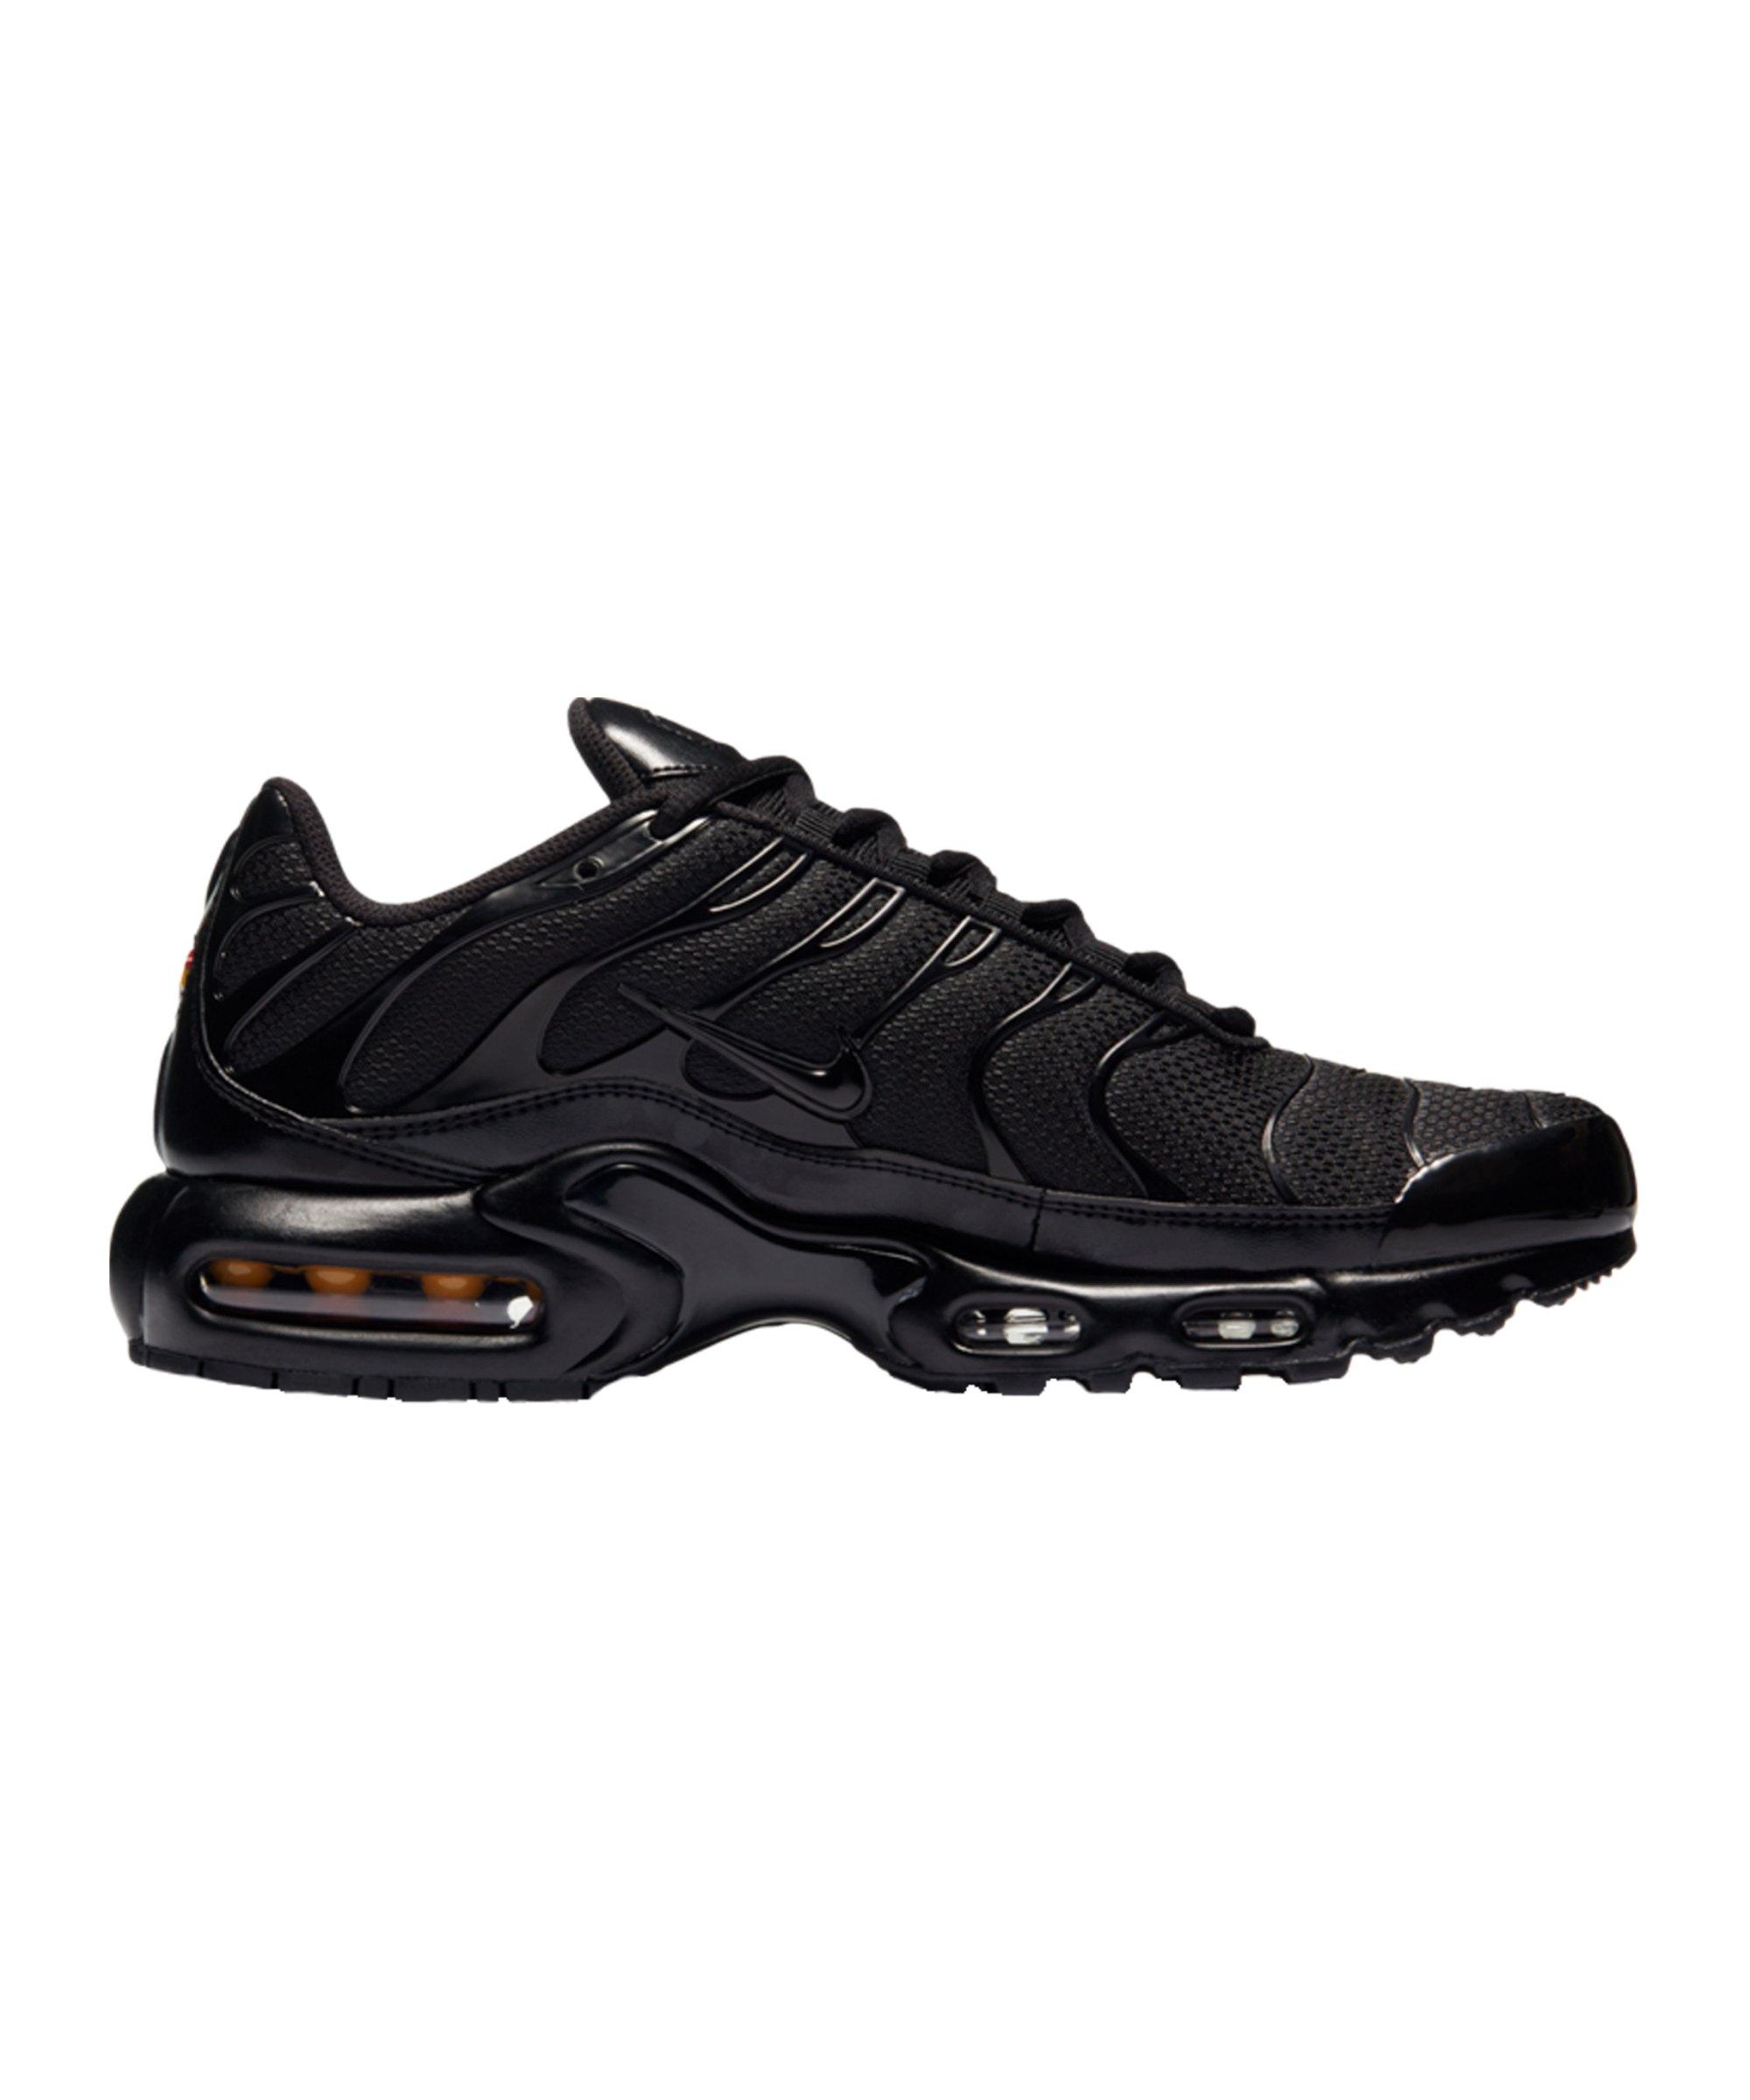 Nike Air Max Plus TN Sneaker Schwarz F050